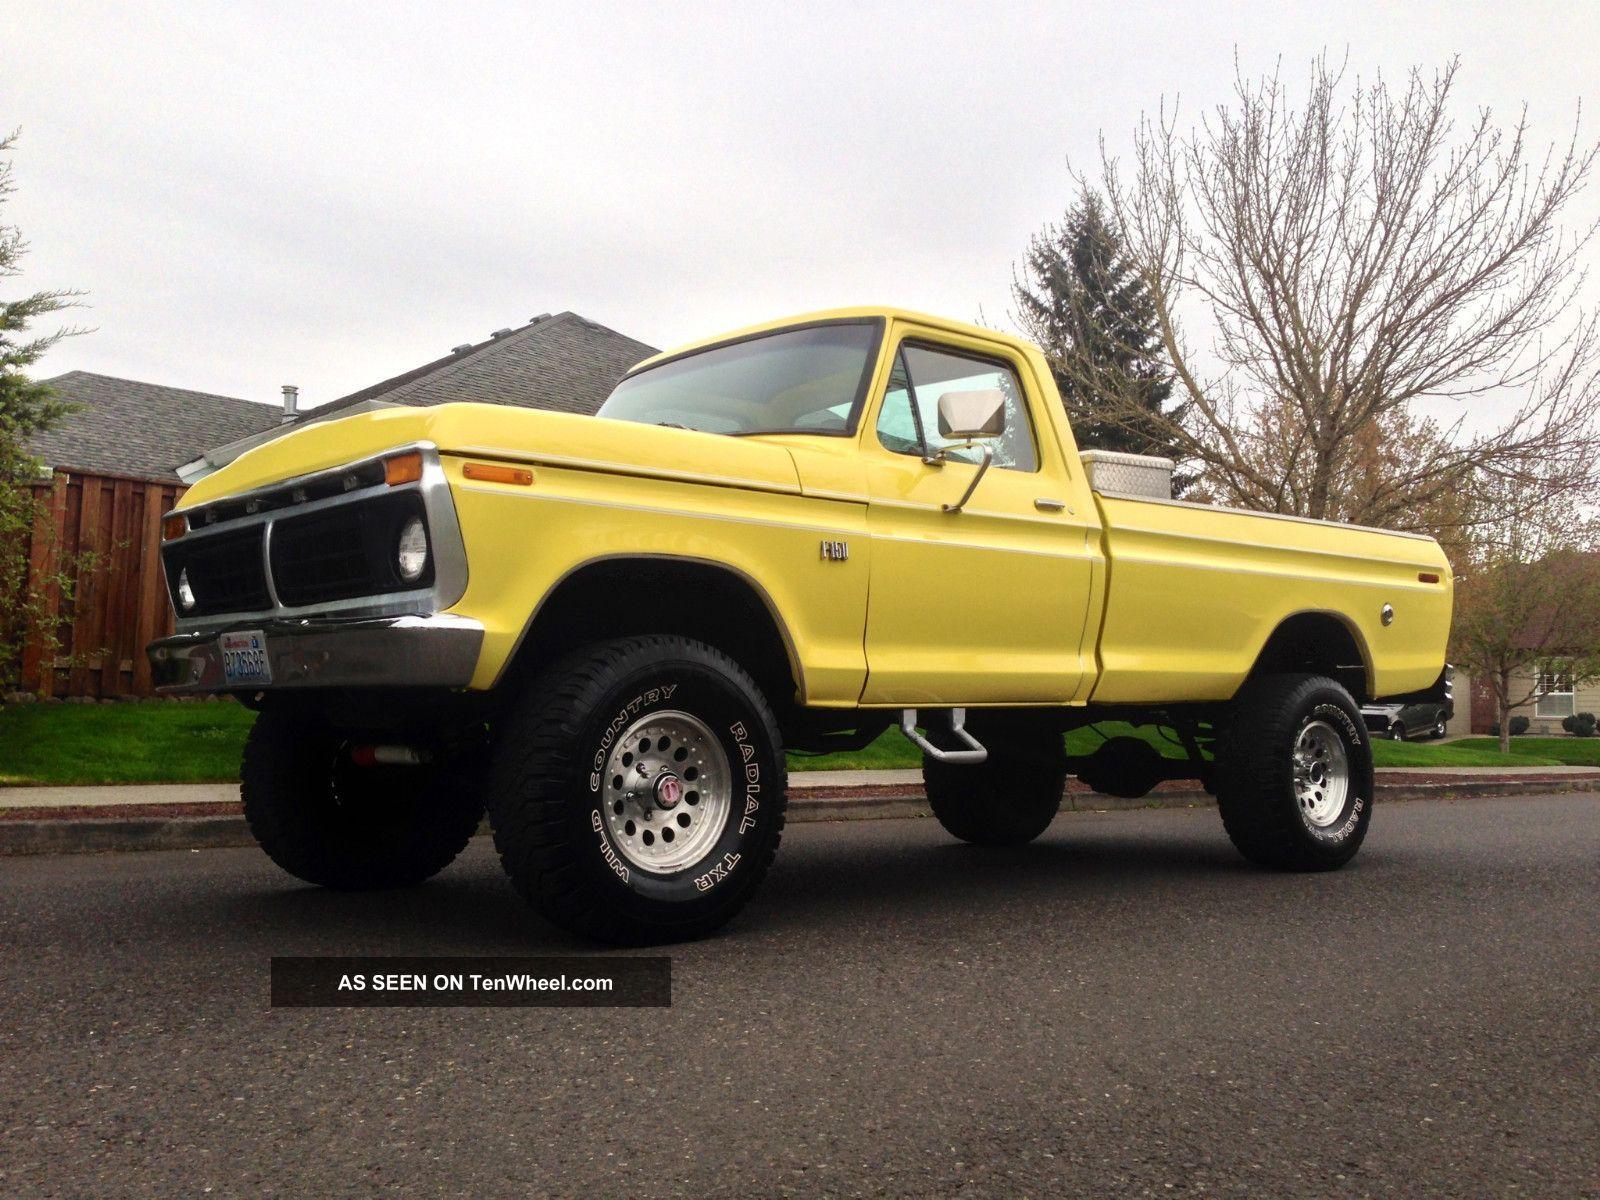 1976 ford f150 ranger 4x4 xlt longbed 1977 1975 1978 1974 f 150 photo [ 1600 x 1200 Pixel ]